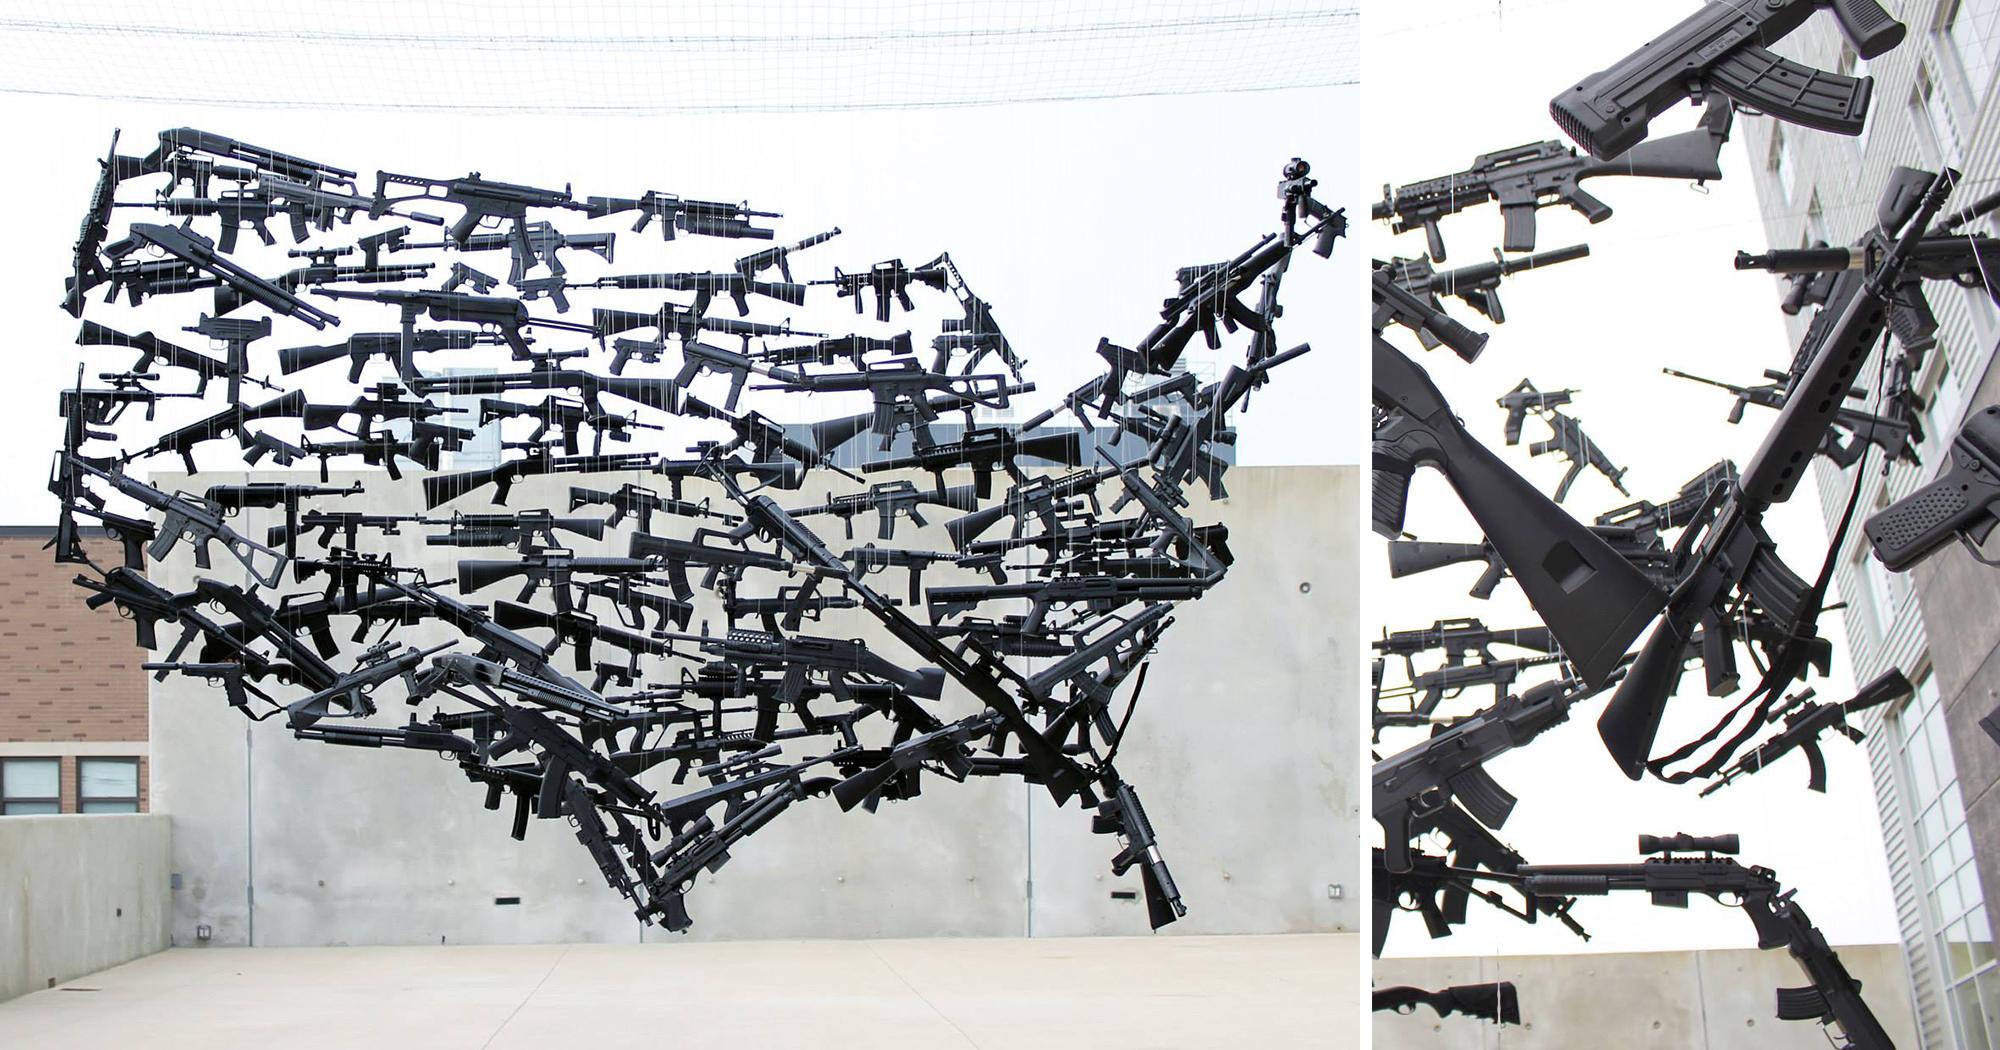 united states gun control problem essay Gun control final essay faced a gun violence problem that saw amélie rossetti, daniel salinas and marcus wilson 2015 united states — gun facts.